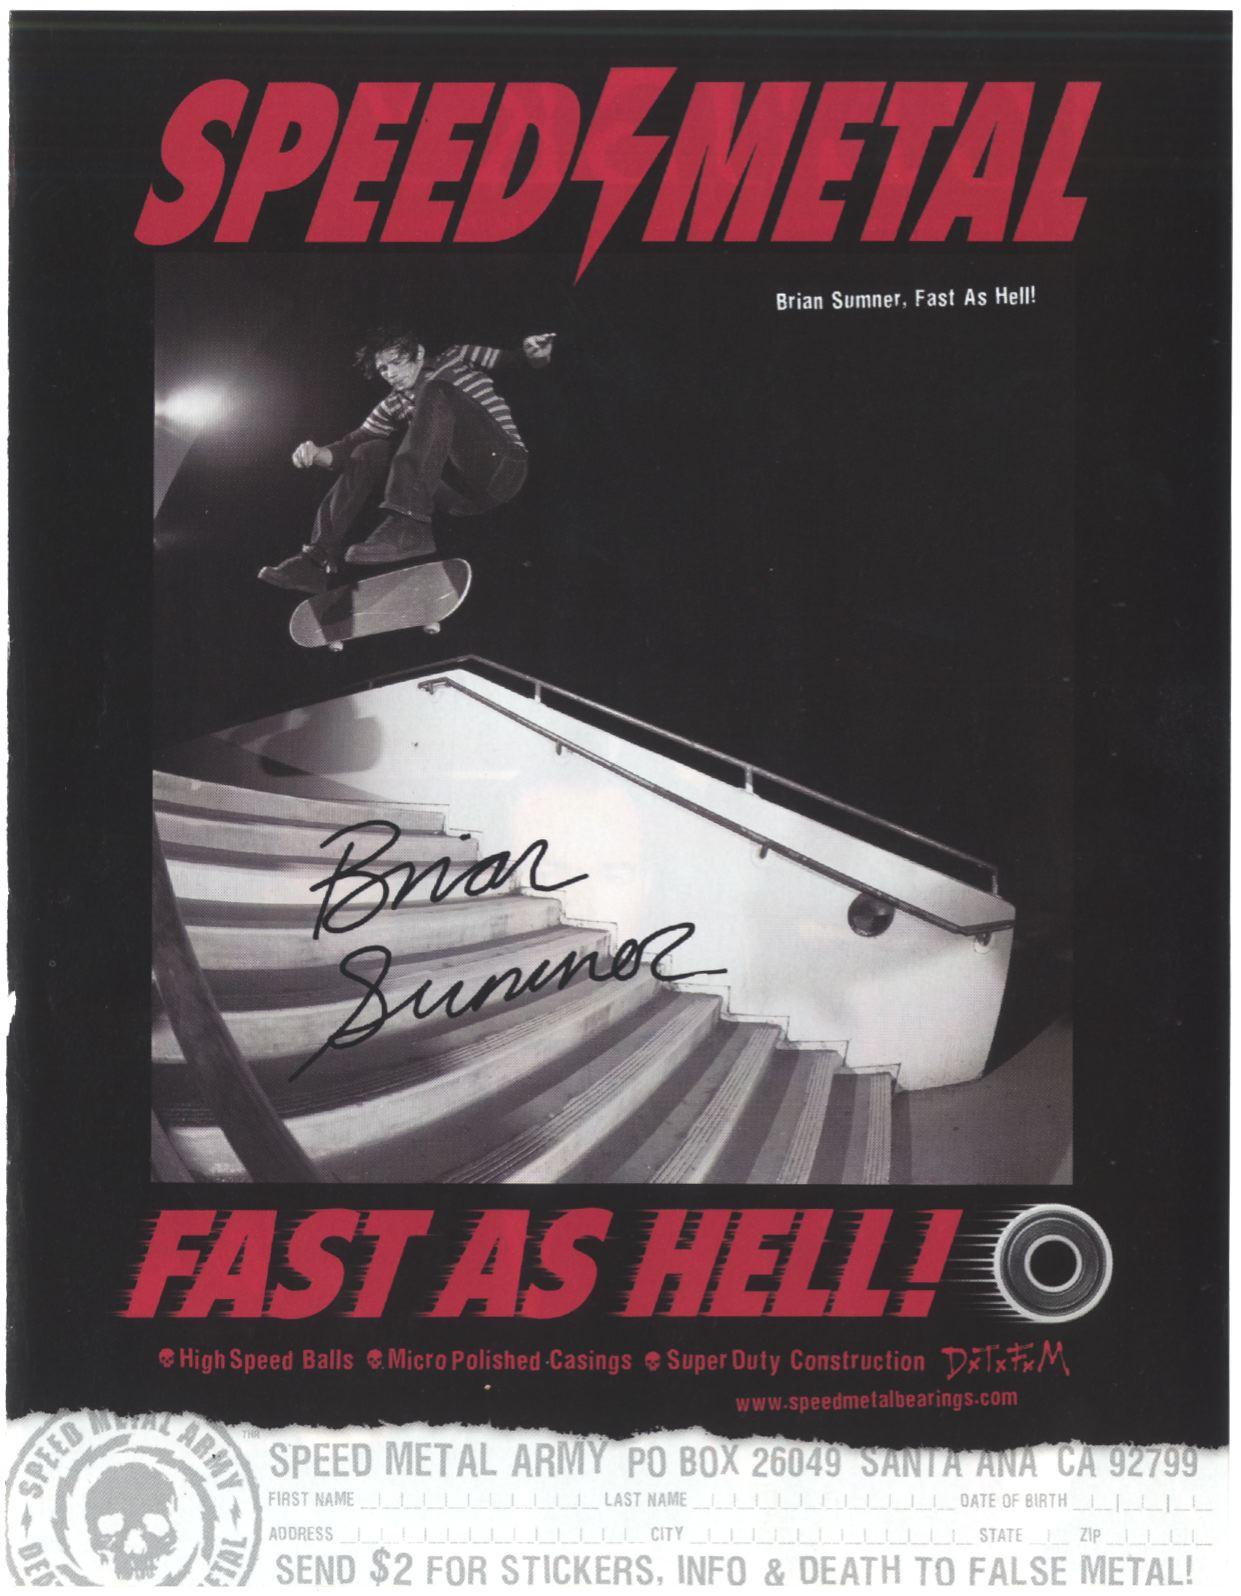 137 speed metal